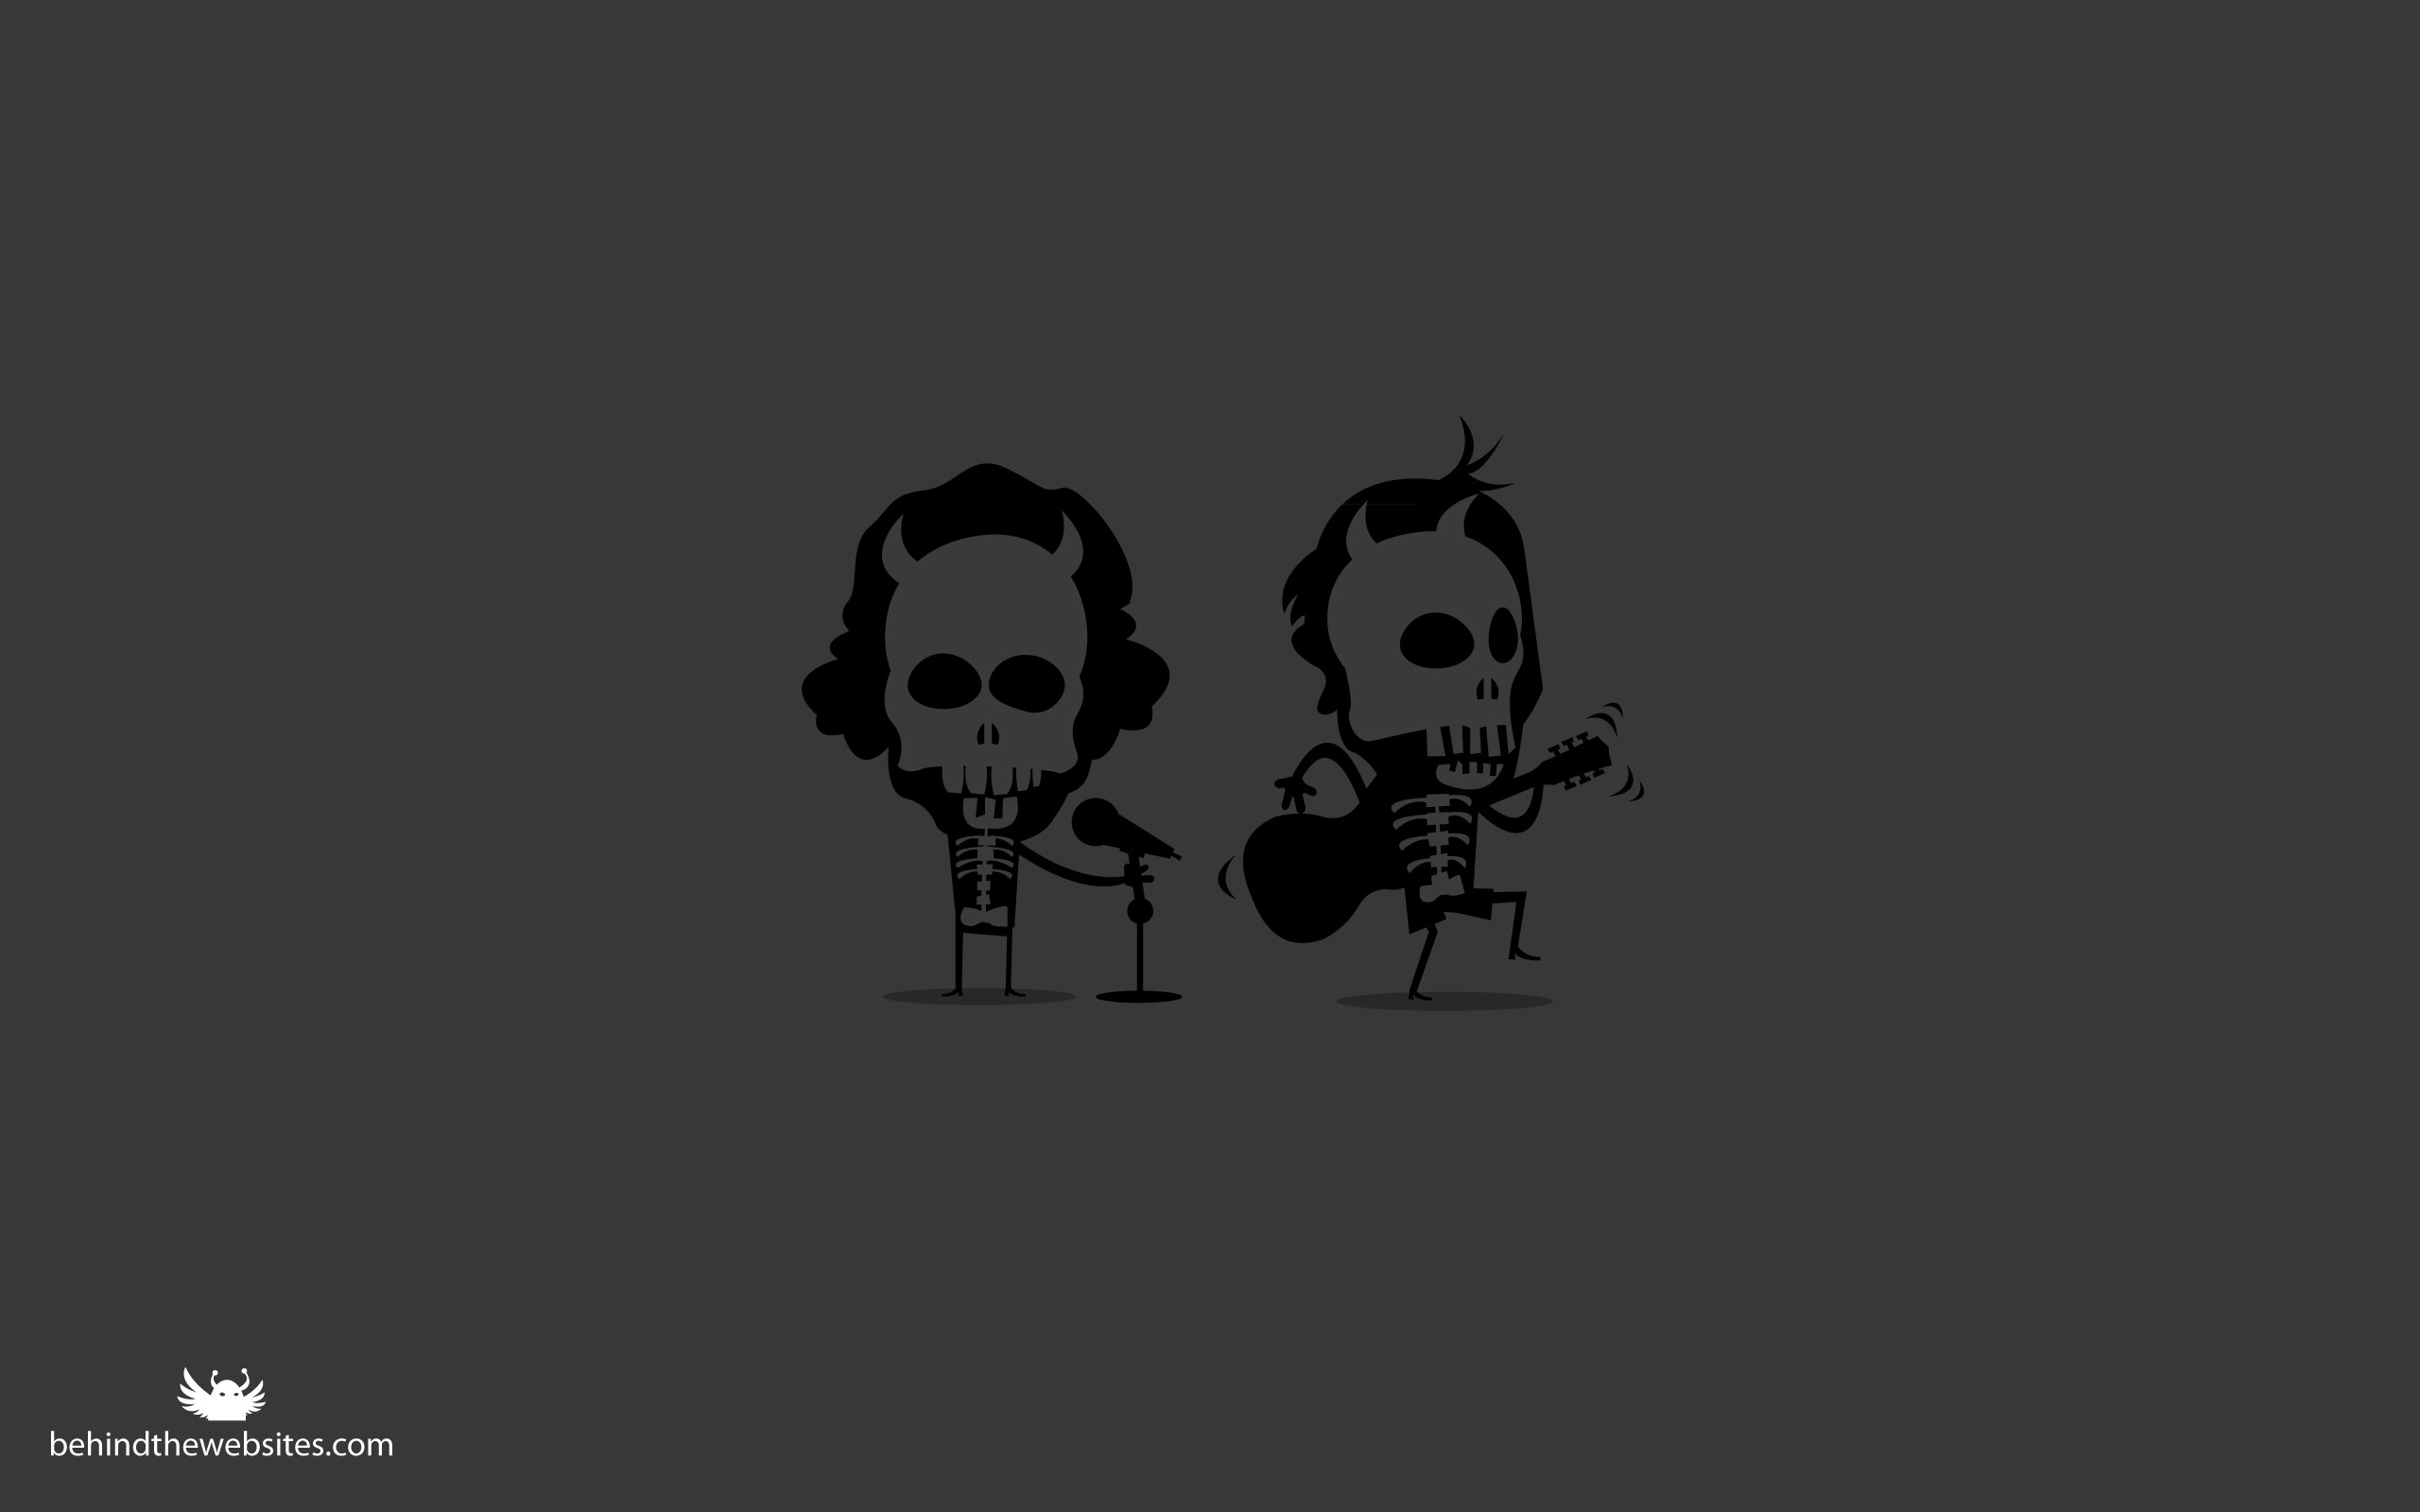 Text Rock Music Monochrome Music Bands 2652x2284 Wallpaper: AC DC Wallpaper HD (65+ Images